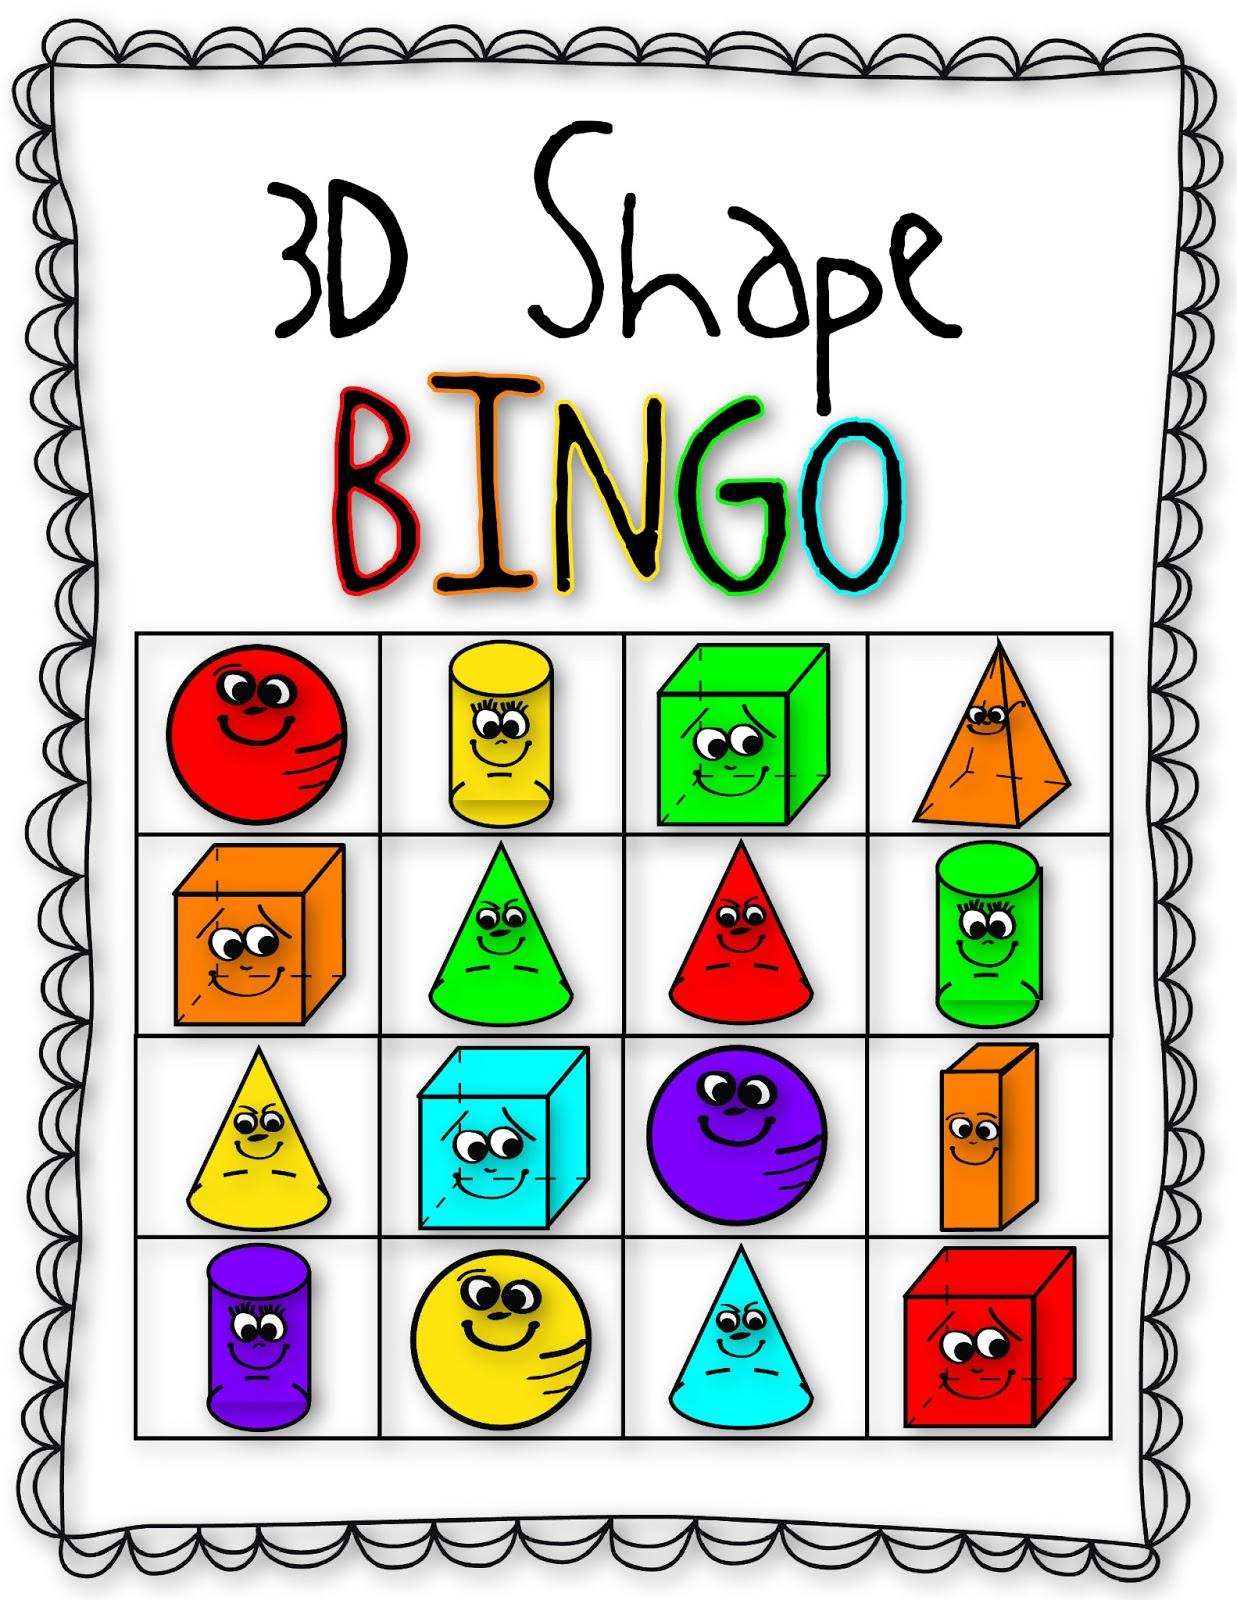 Bingo clipart merchandise. Panda free images bingoclipart